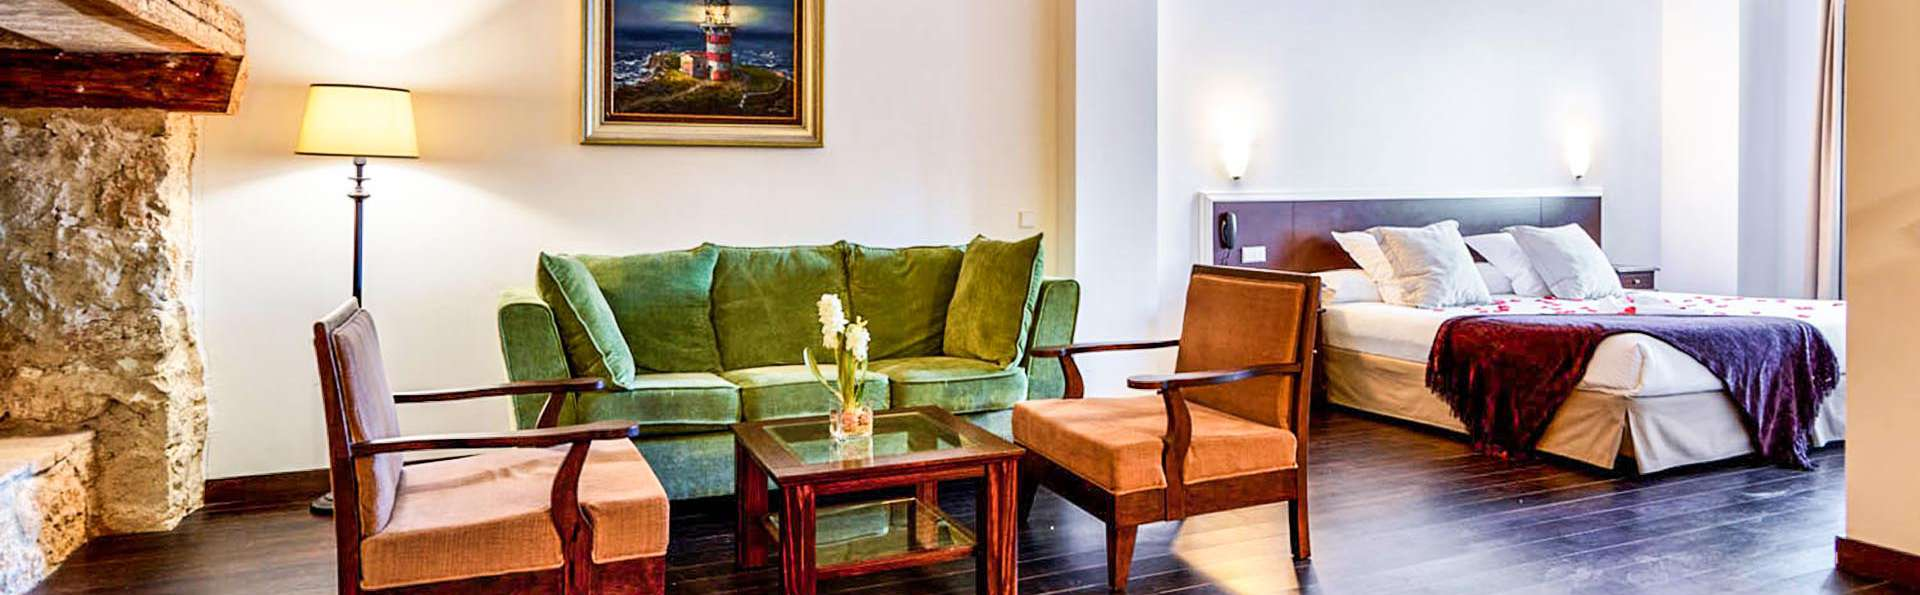 Palacio del Infante Don Juan Manuel Hotel Spa - EDIT_belmonte-hospederia_11.jpg